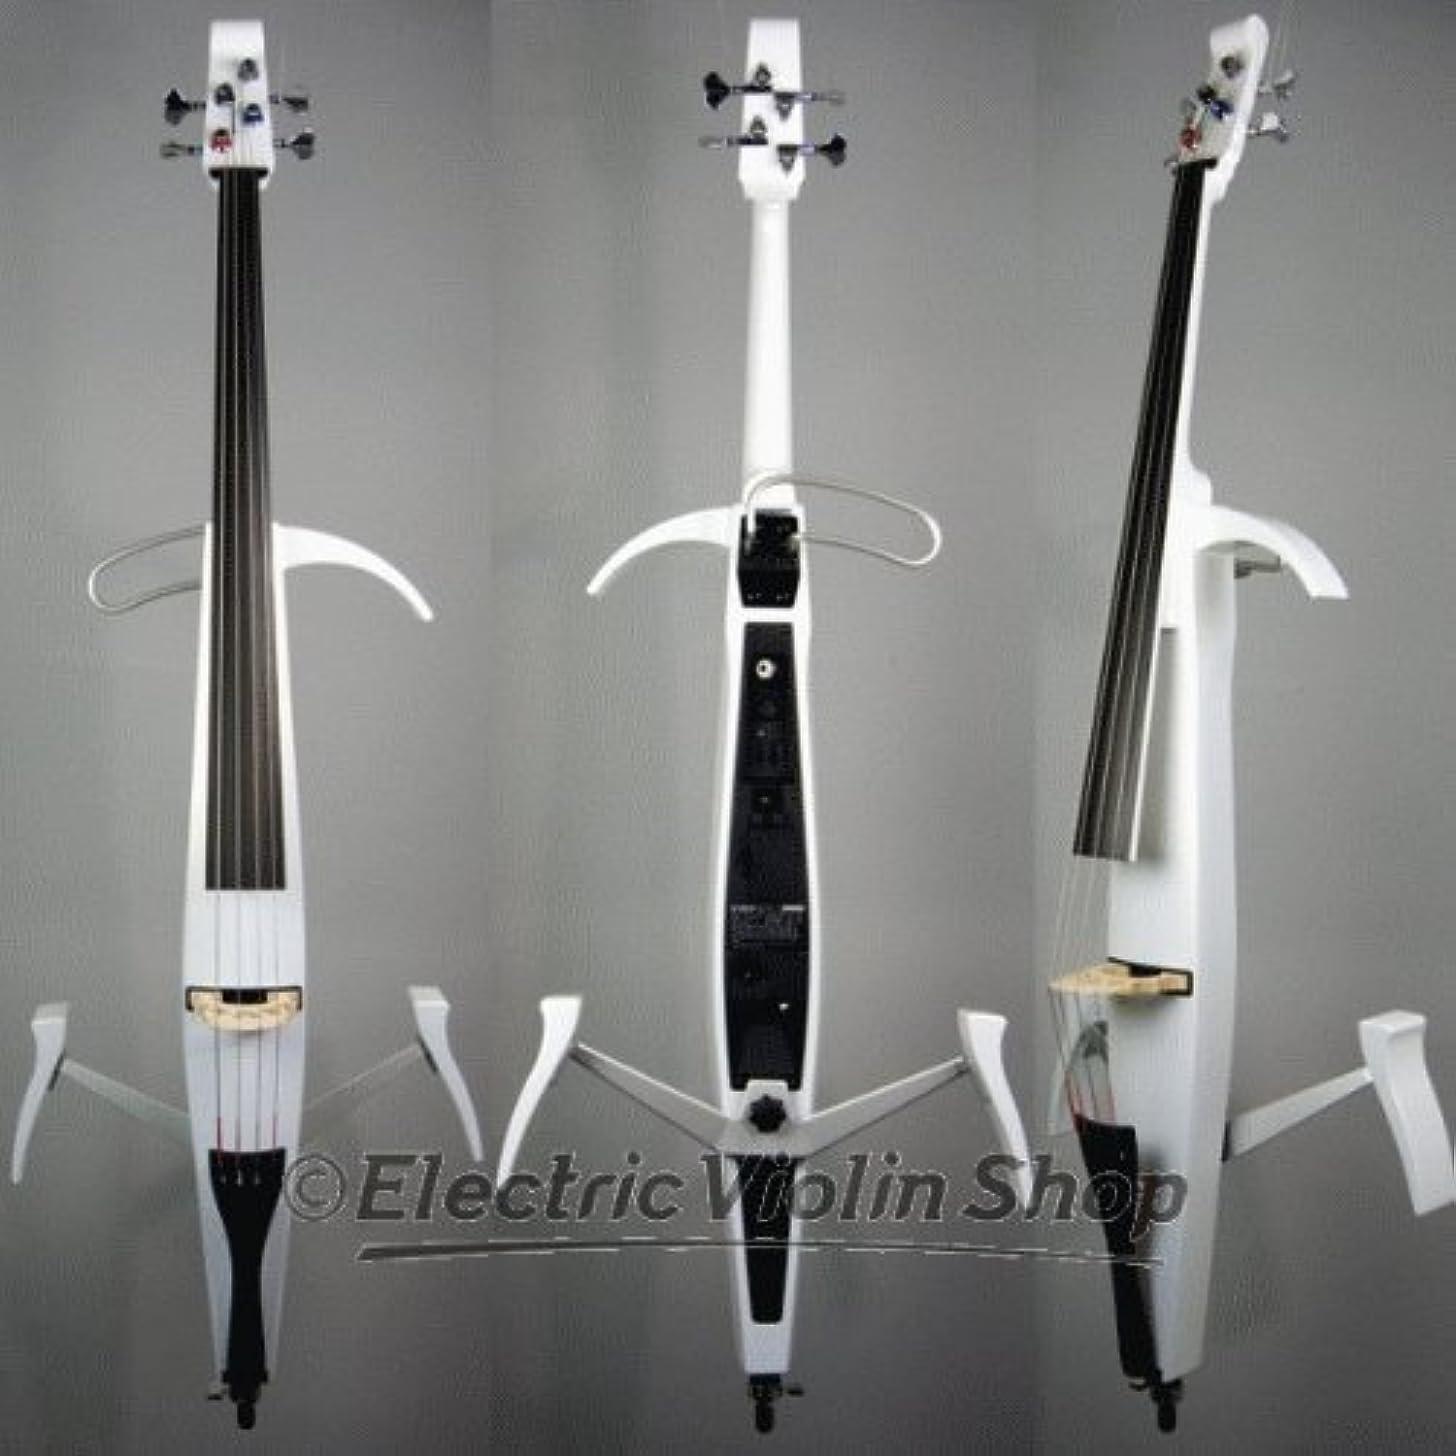 Yamaha SVC-50 Silent Cello, Pearl White